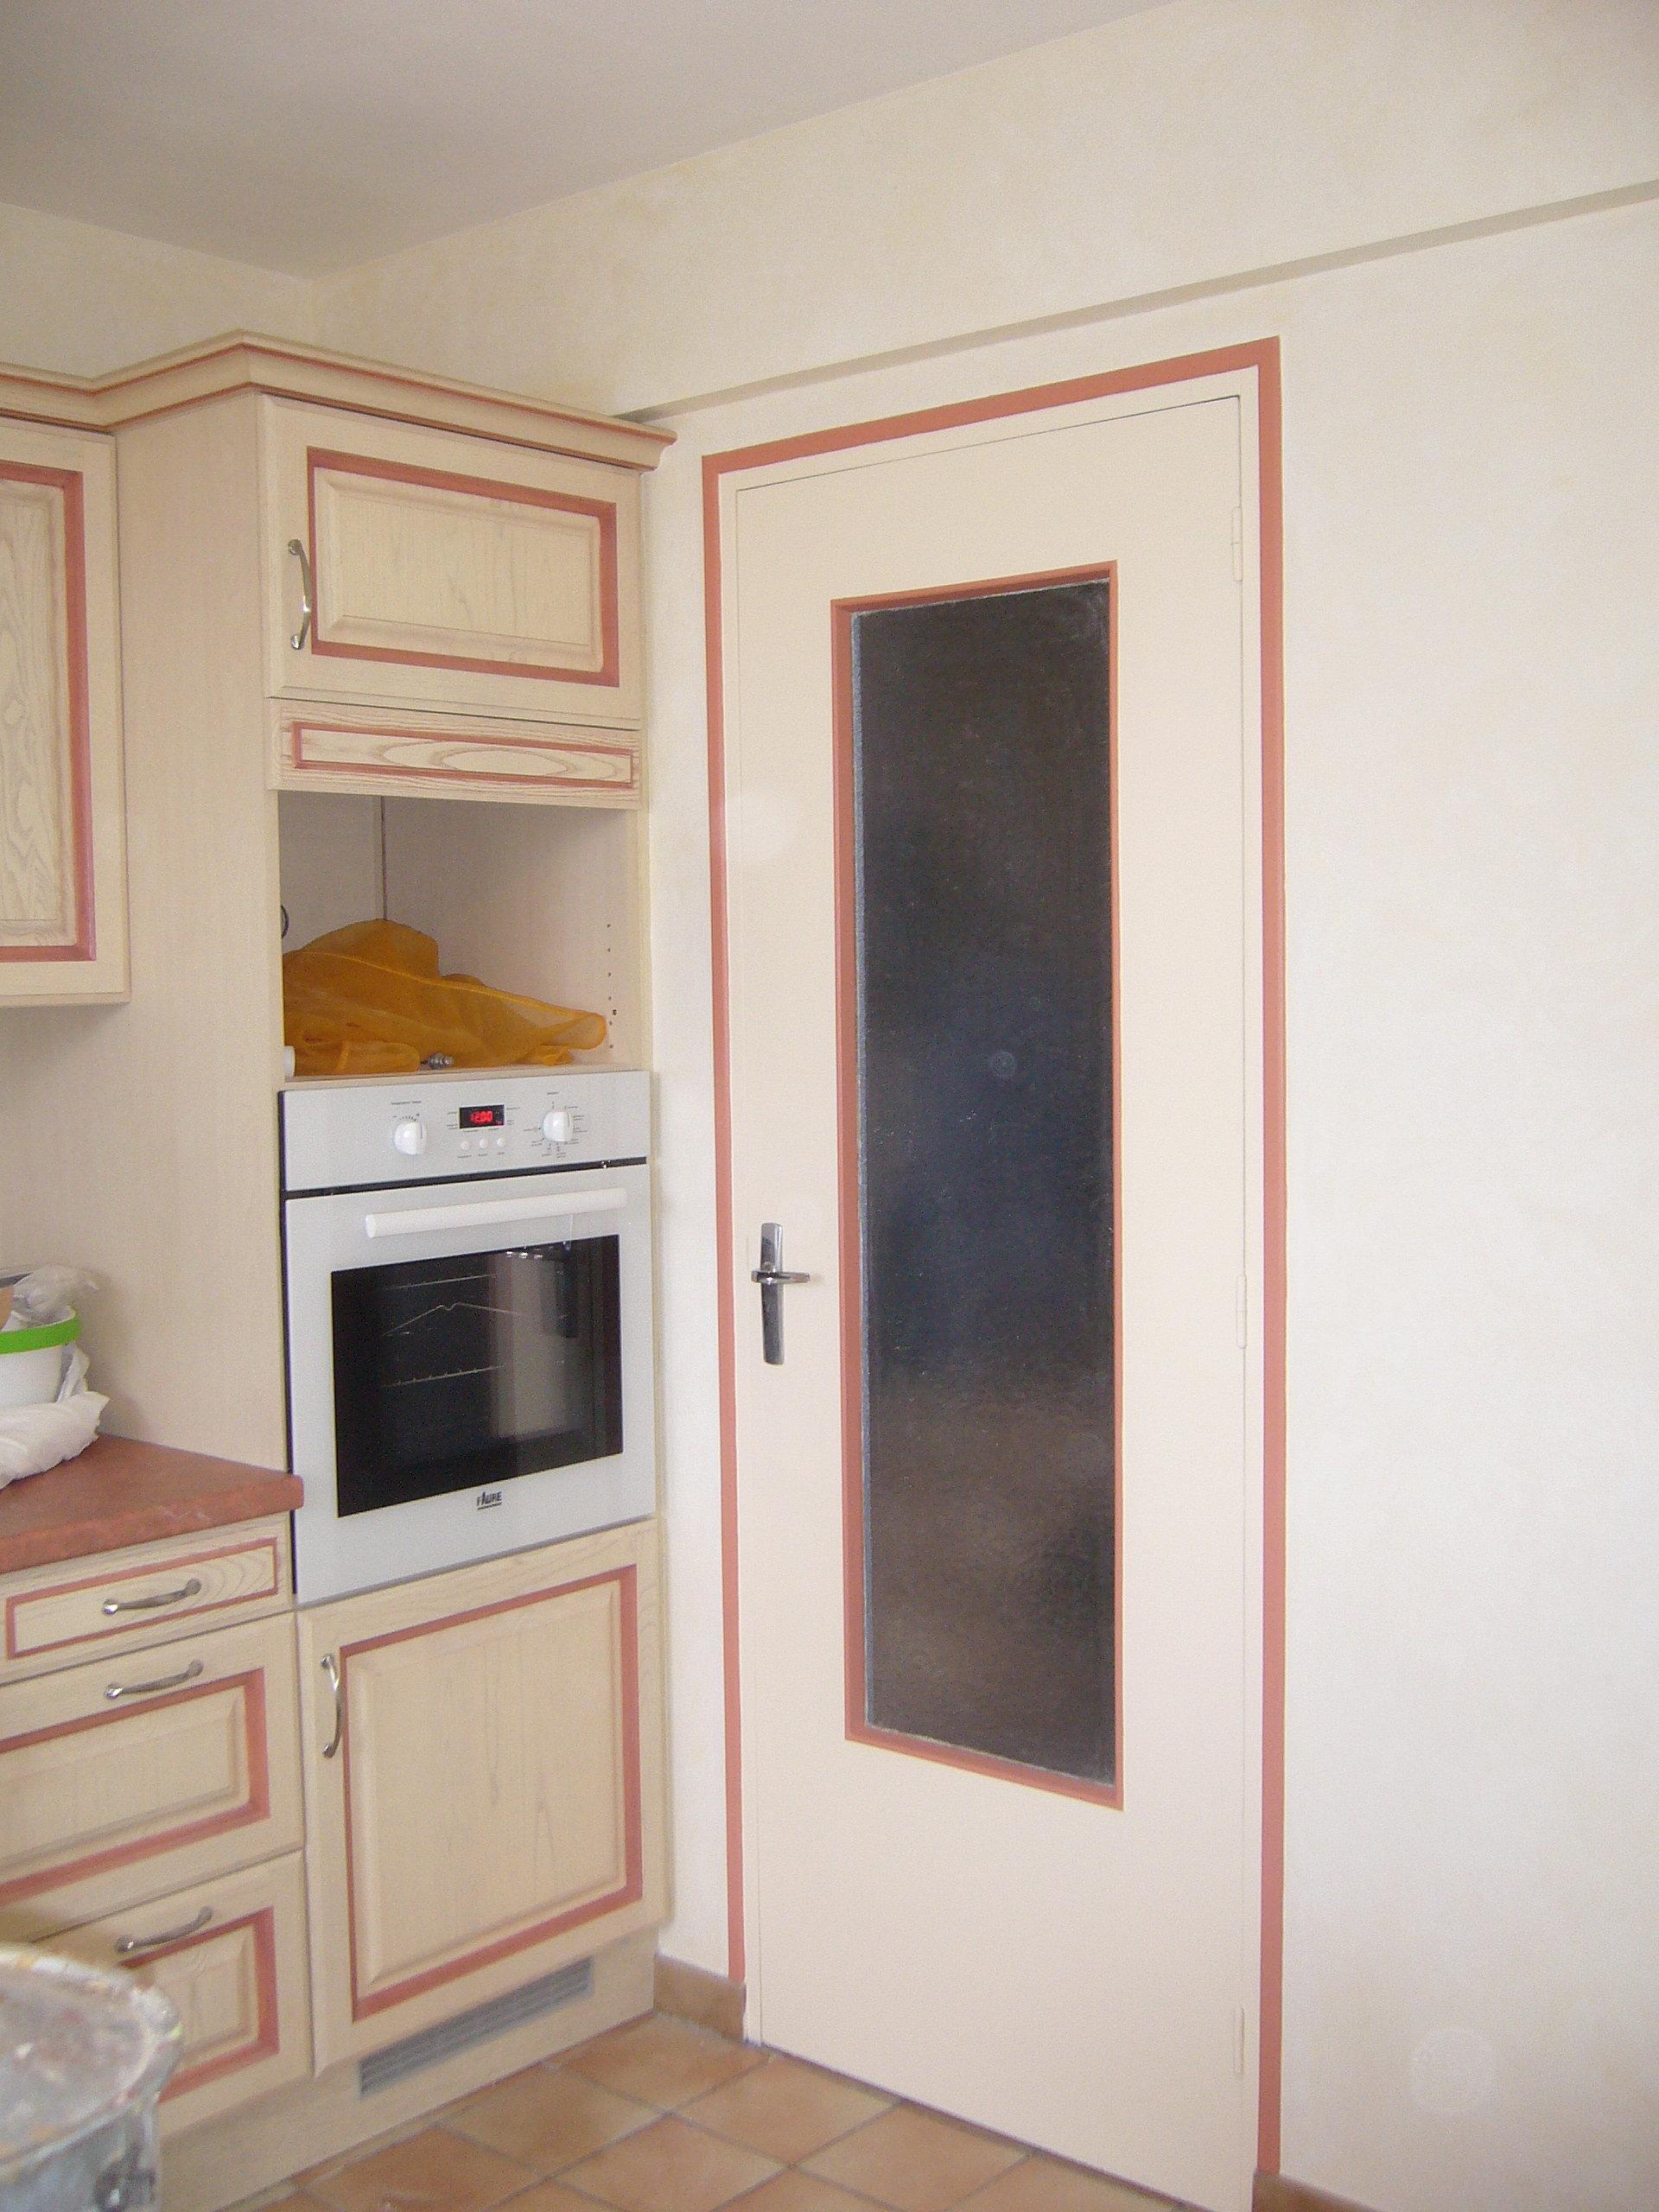 la peintre bio vanessa burgui re. Black Bedroom Furniture Sets. Home Design Ideas